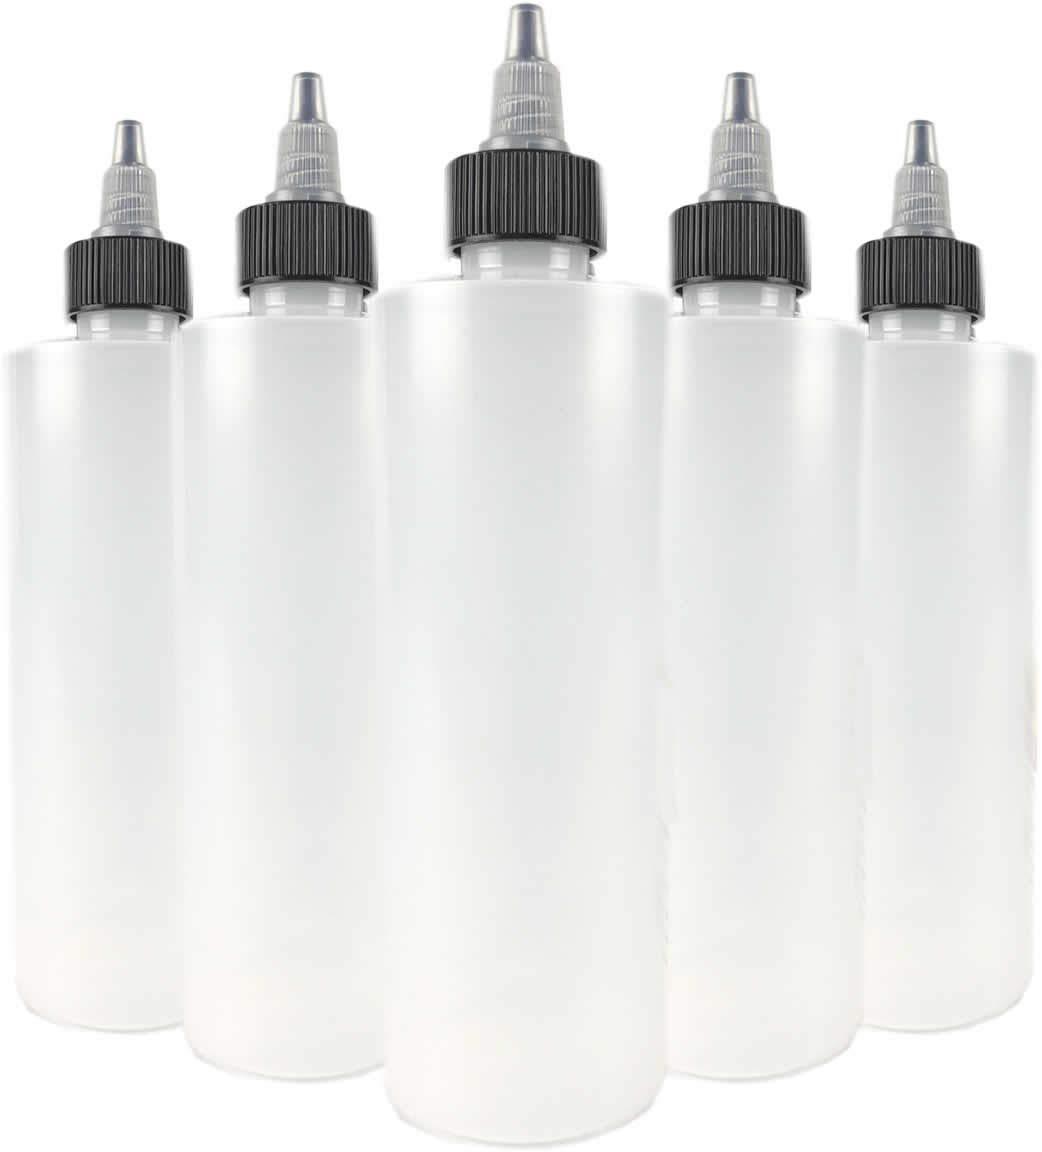 Hobbyland Squeeze Bottles with Twist Cap (8 oz, 6 Bottles) by Hobbyland